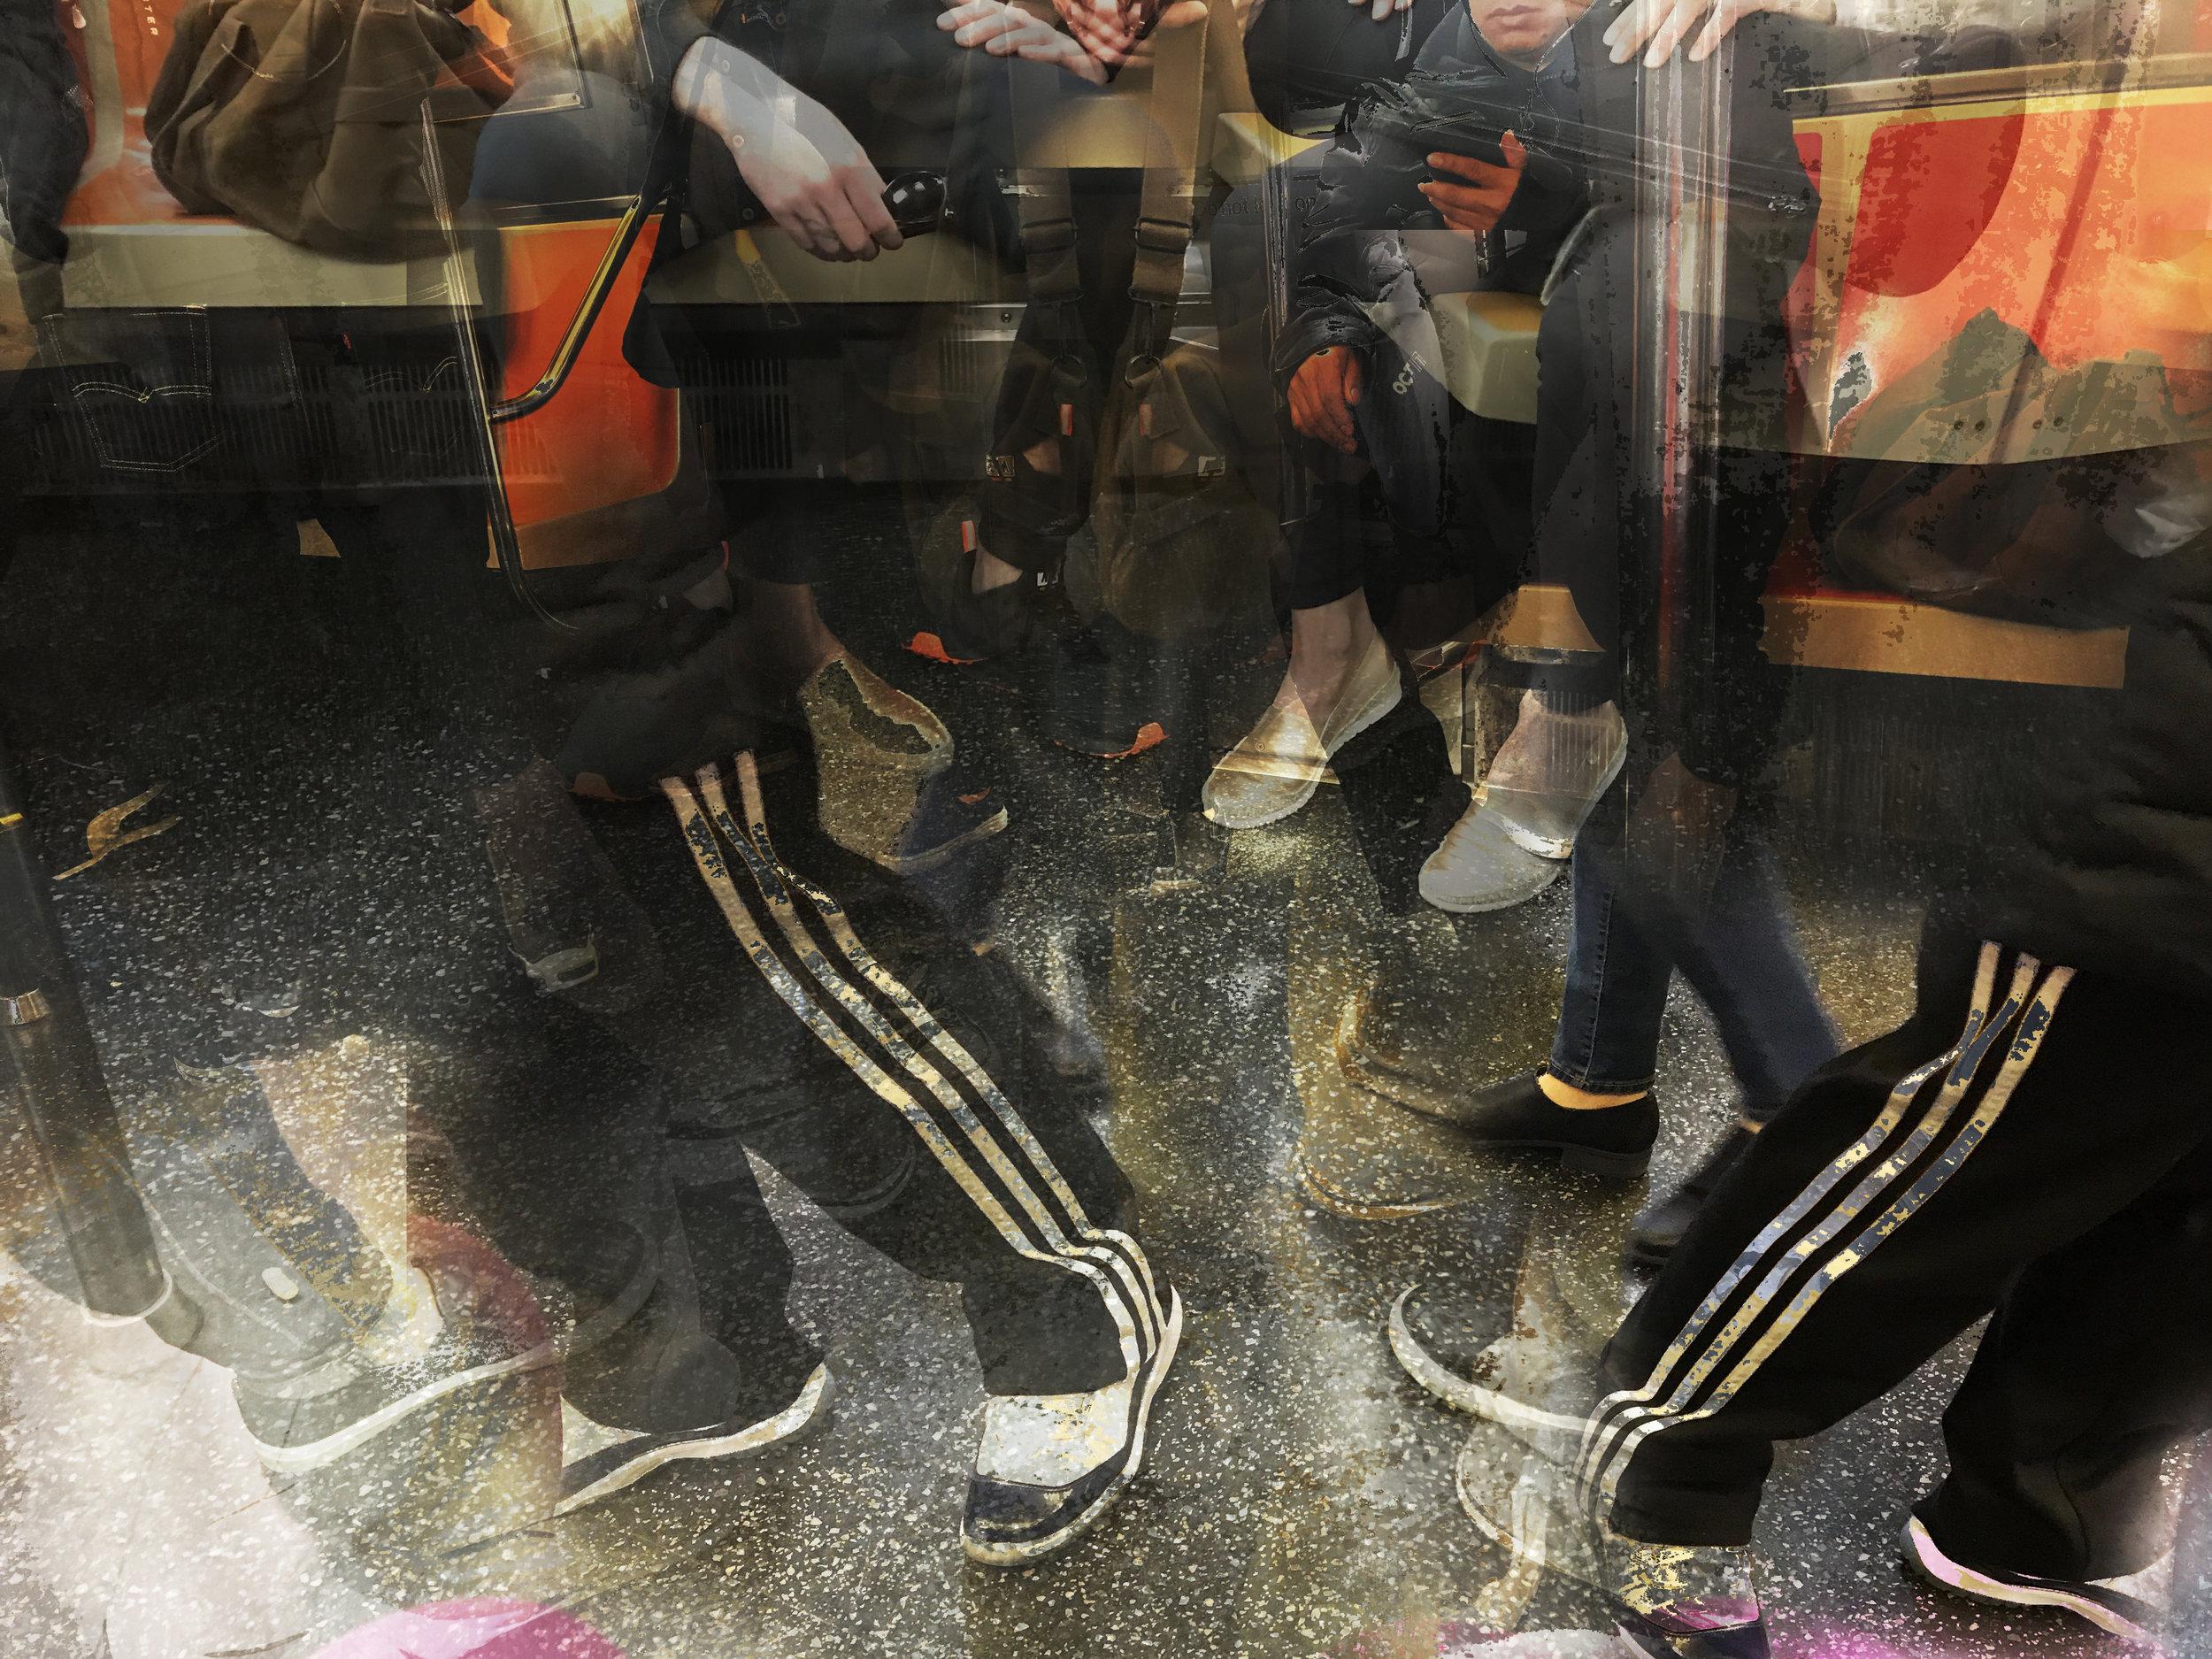 Wilkinson_Subway_Feet.jpg